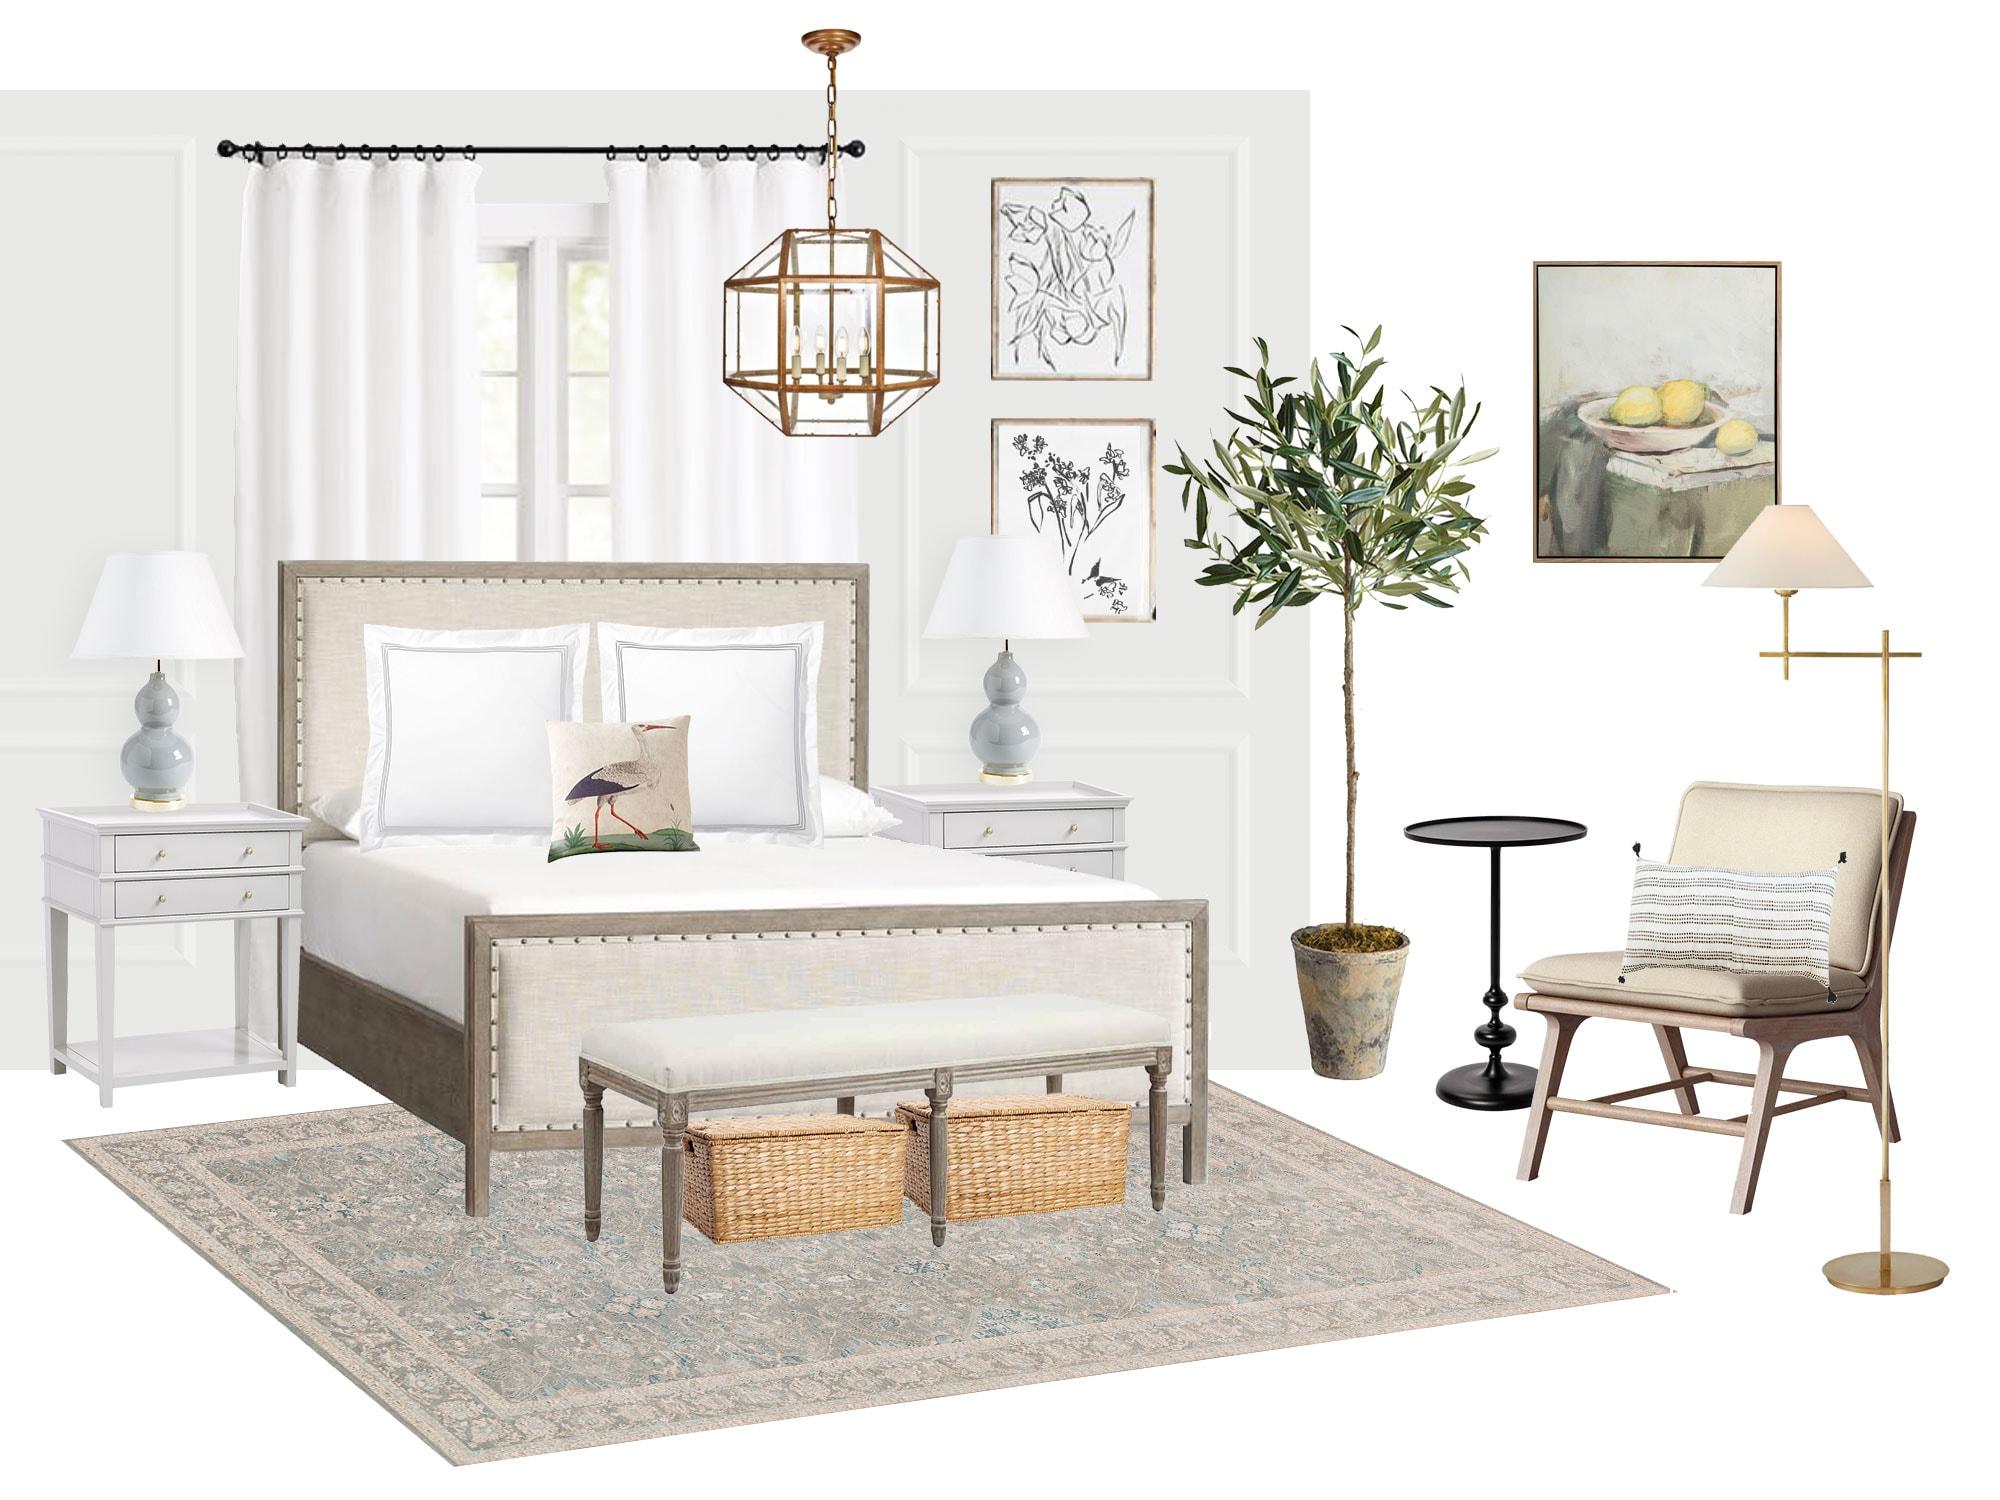 serene bedroom mood board inspiration board